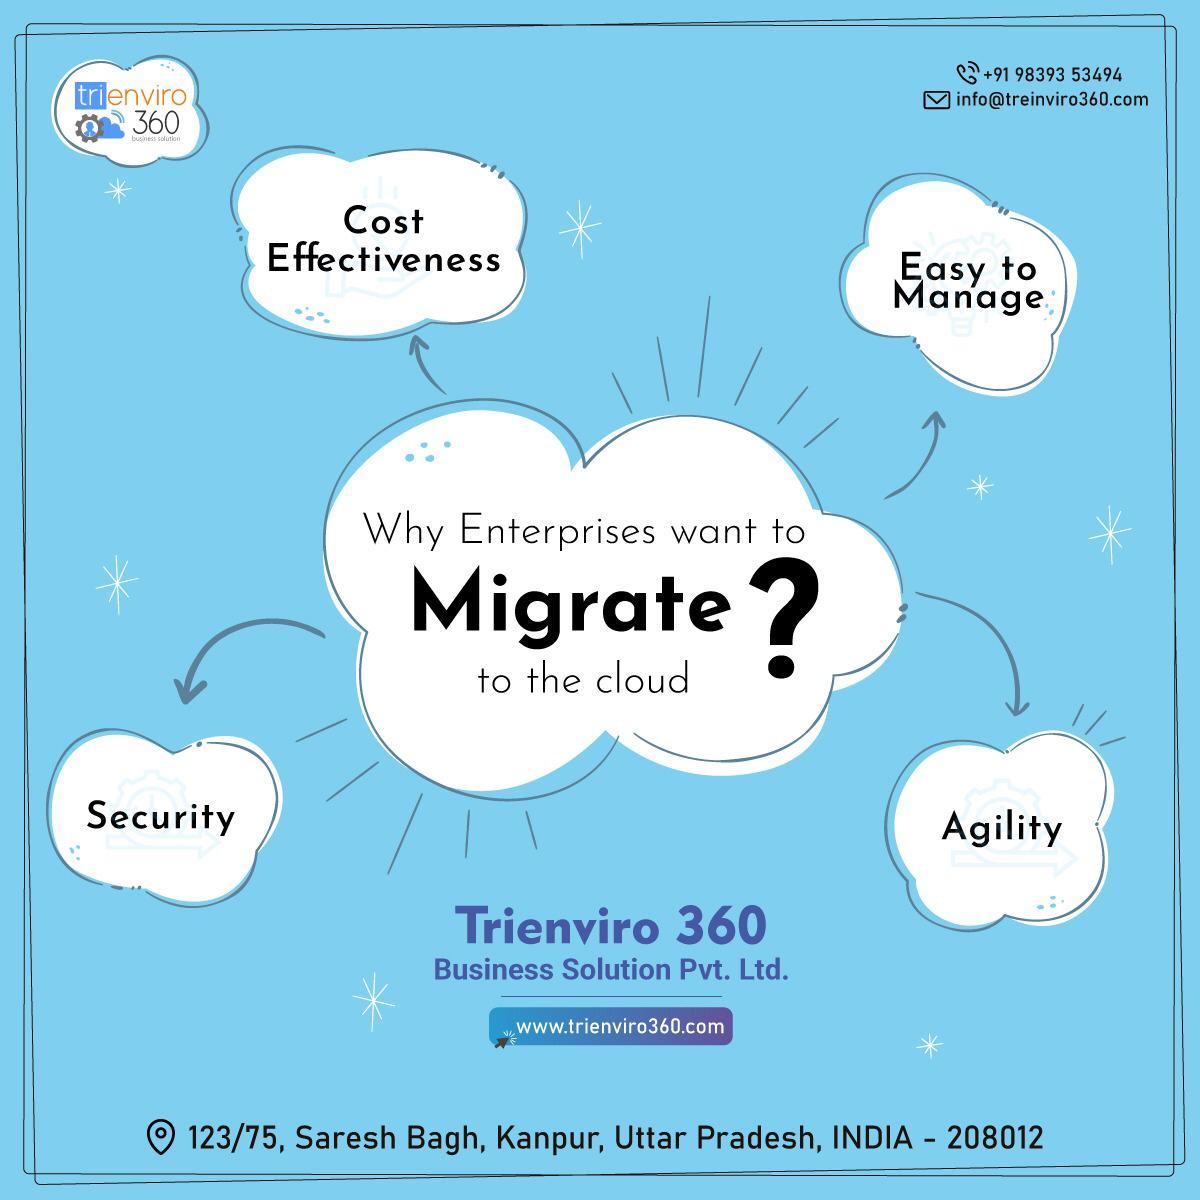 Trienviro 360 - Best Web designing company in Kanpur